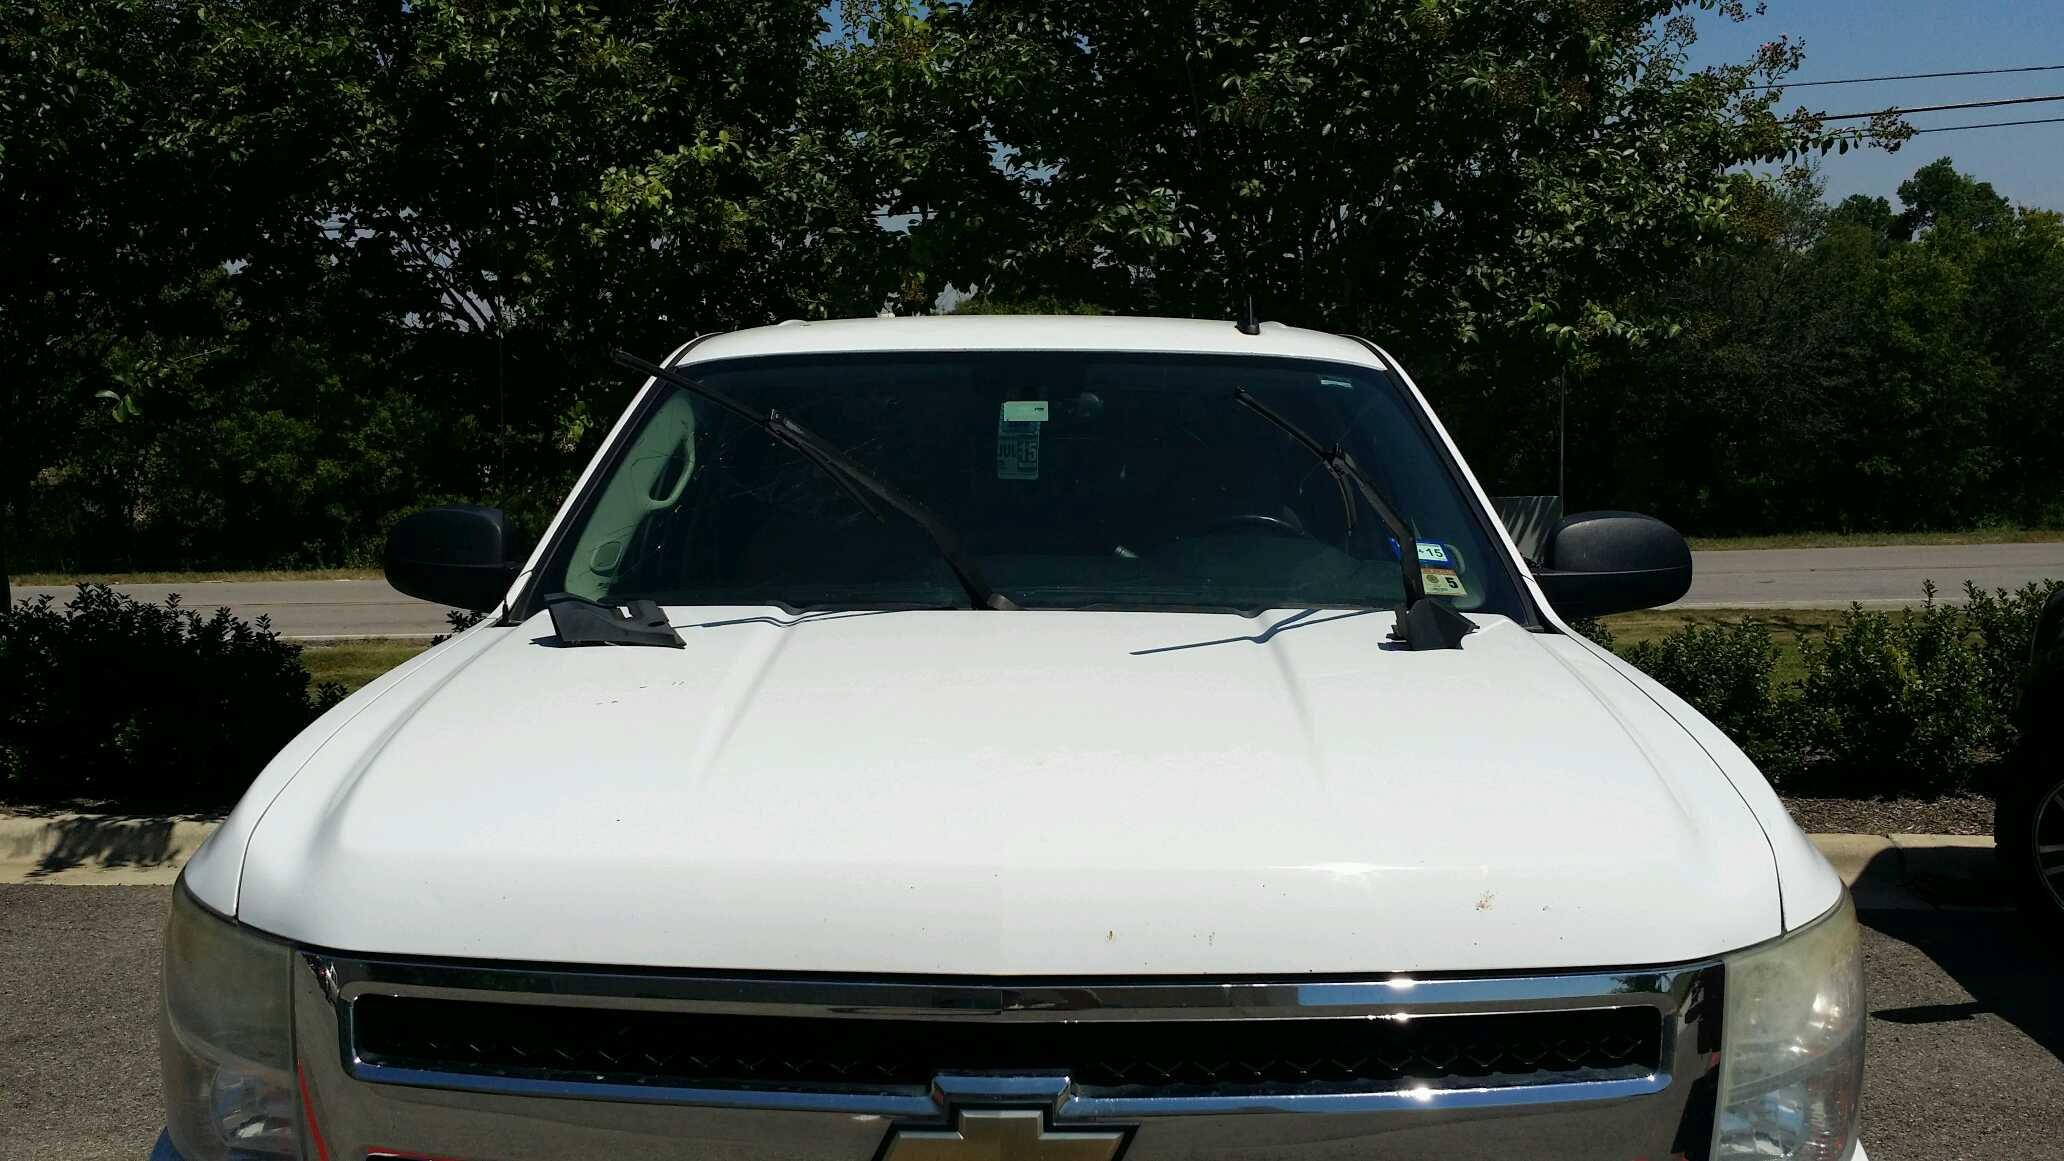 Silverado C1500 4 Door Crew Cab Windshield Replacement Prices 1976 Chevrolet 2007